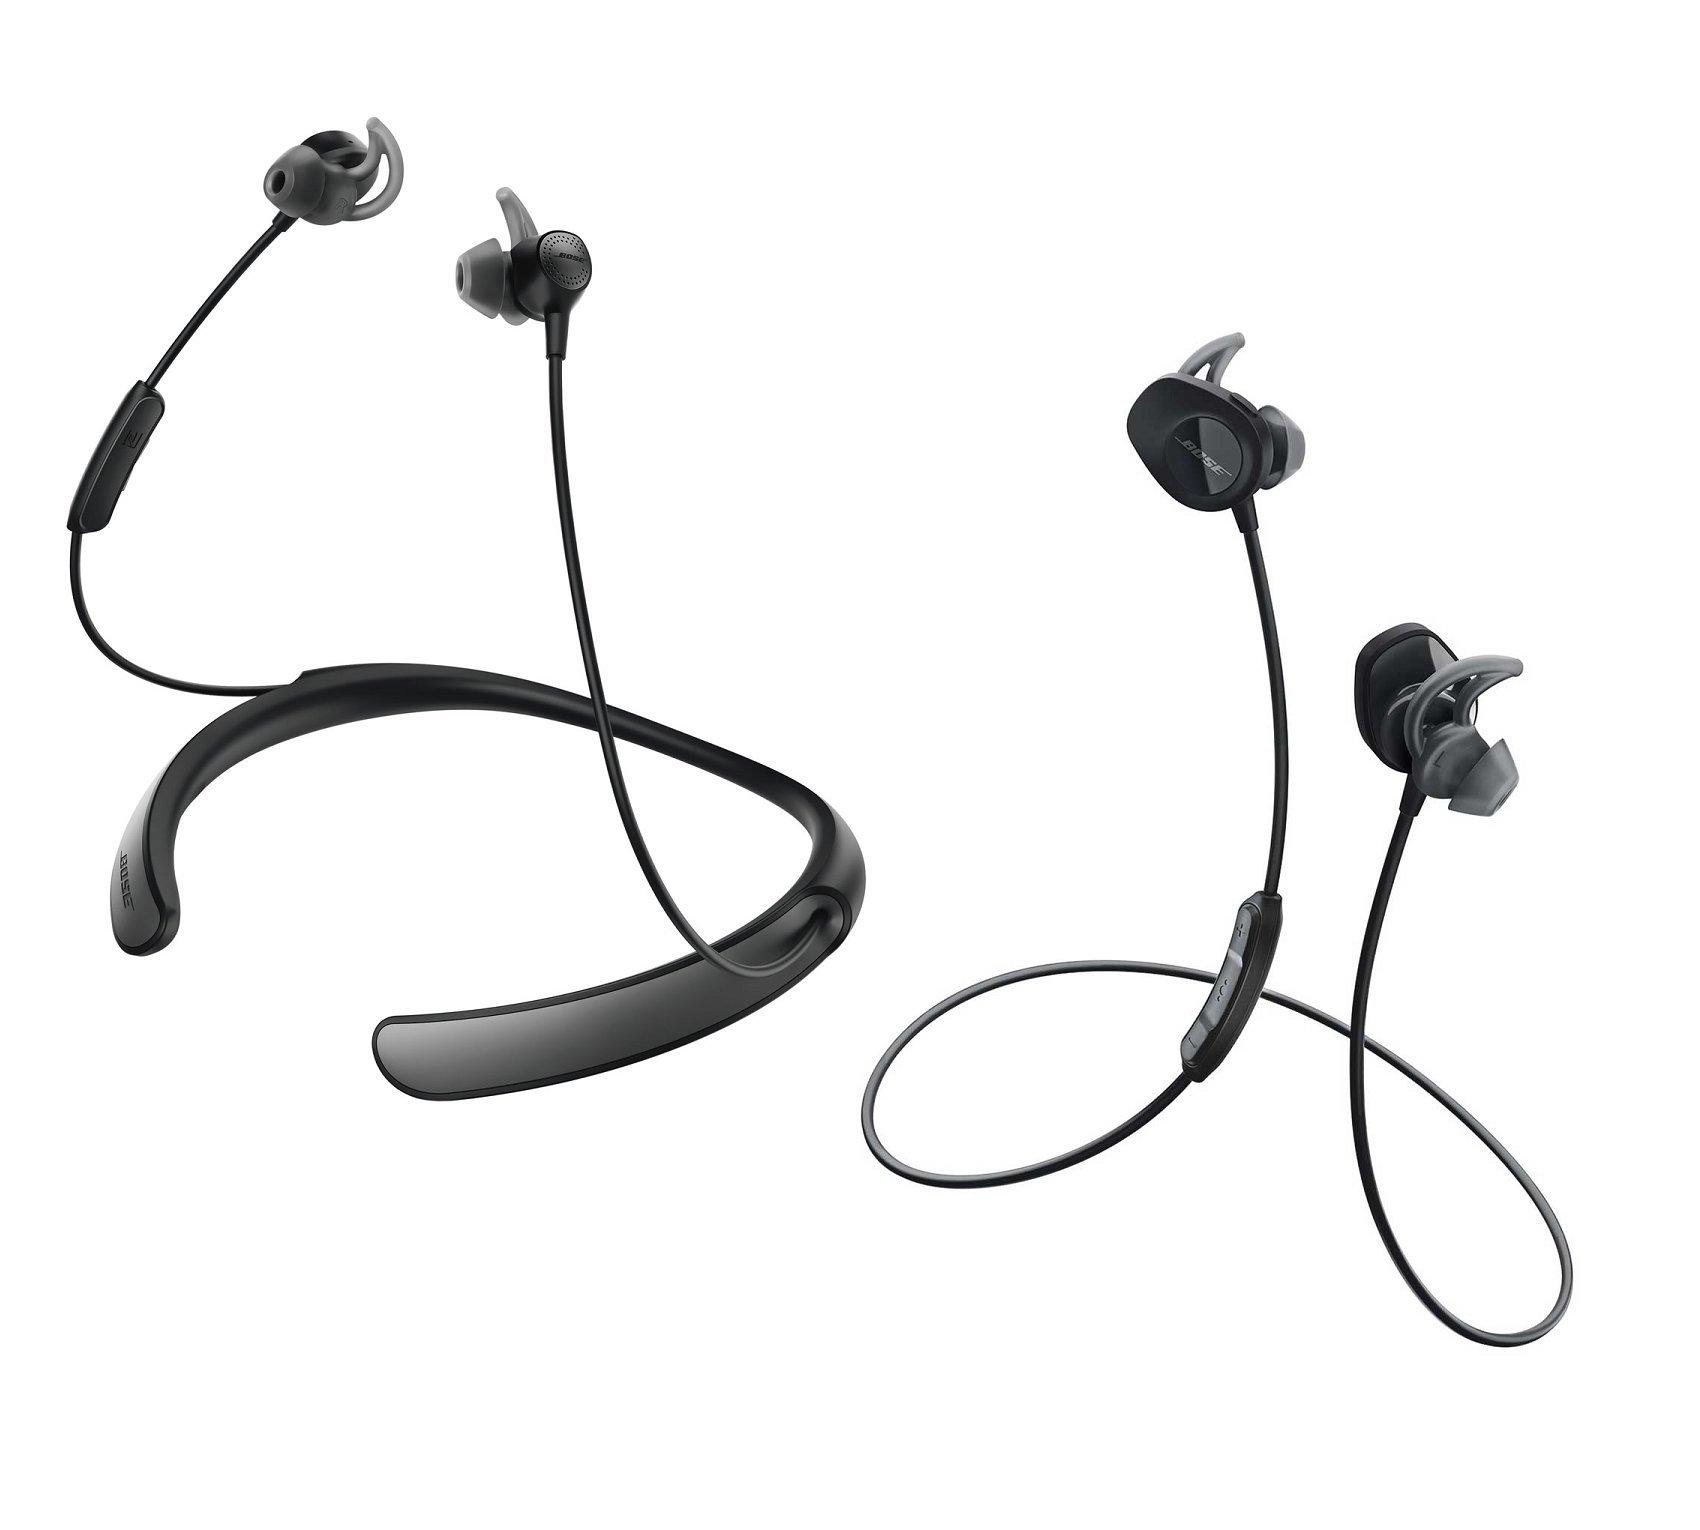 Bose Bluetooth Headphone Bundle - SoundSport Wireless Black & QuietControl 30 Black In-ear Headphones by Bose